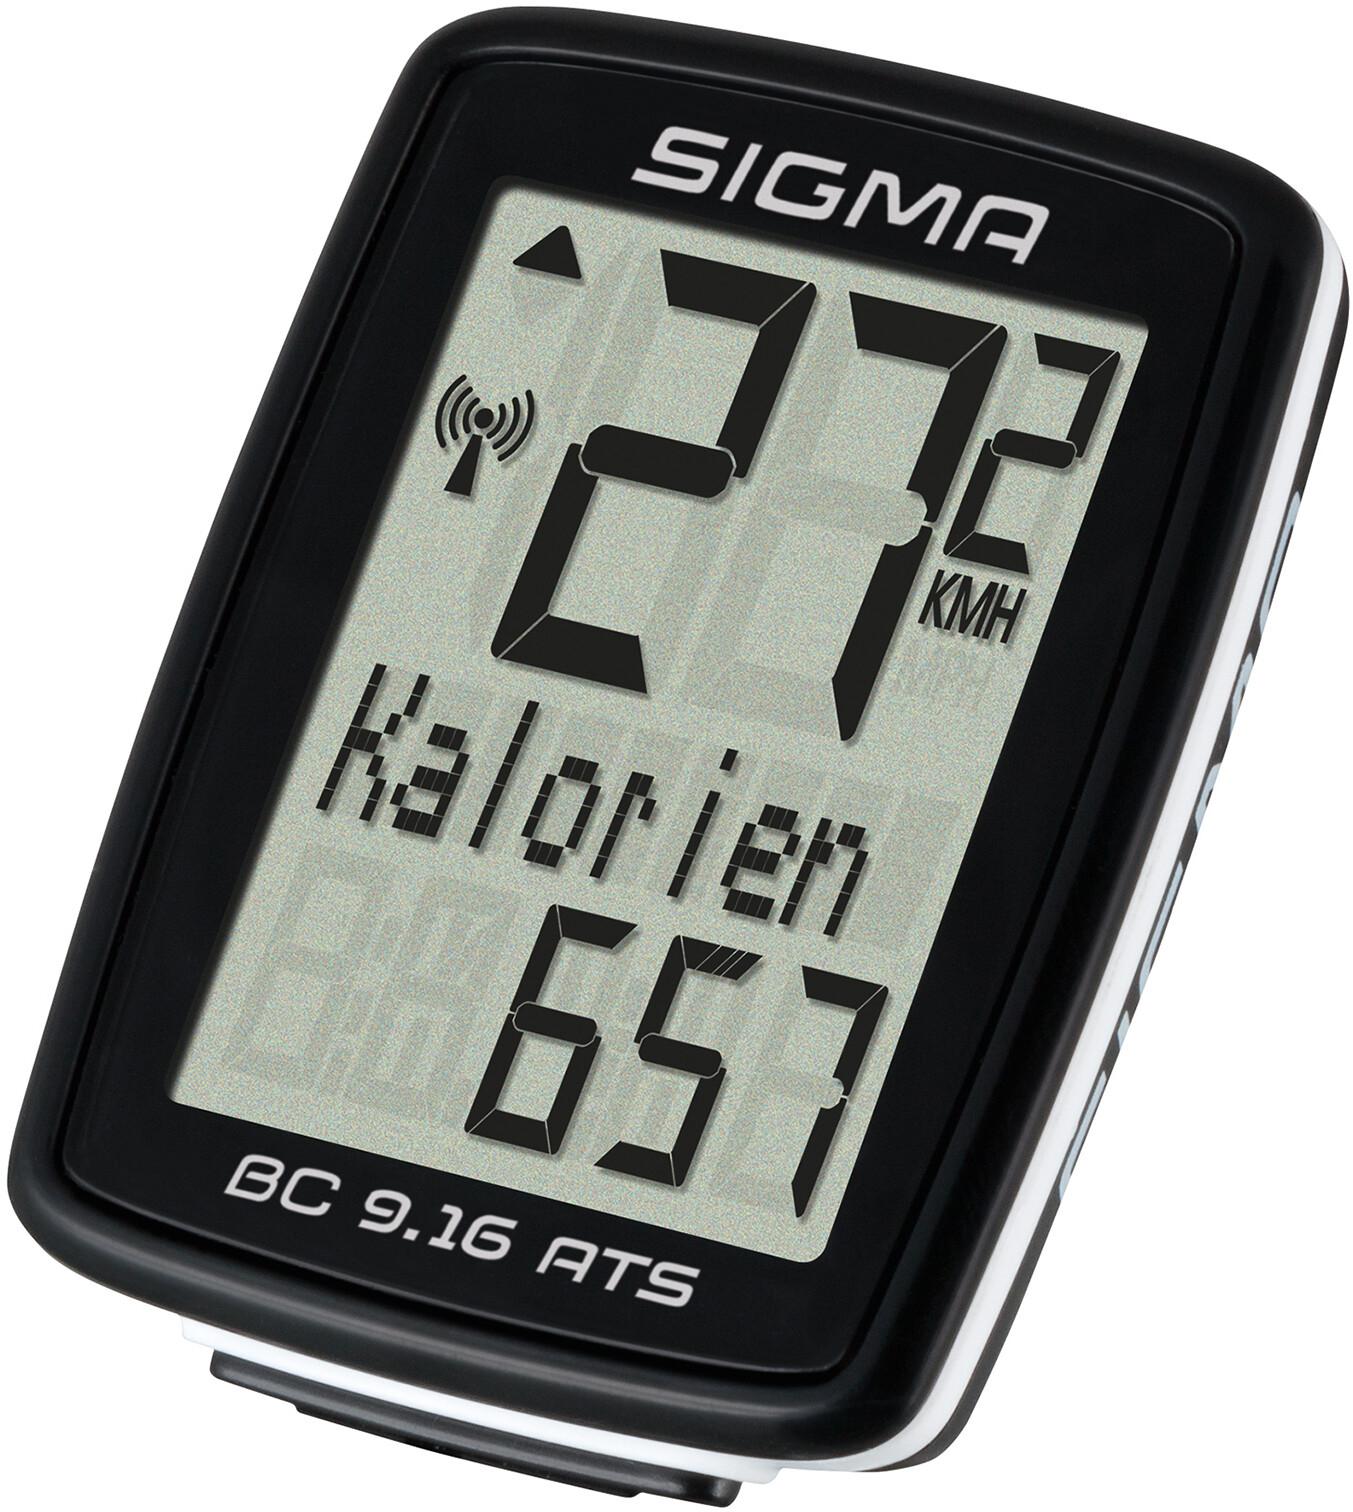 "Sigma ""Sport BC 9.16 ATS"" Fahrradcomputer"